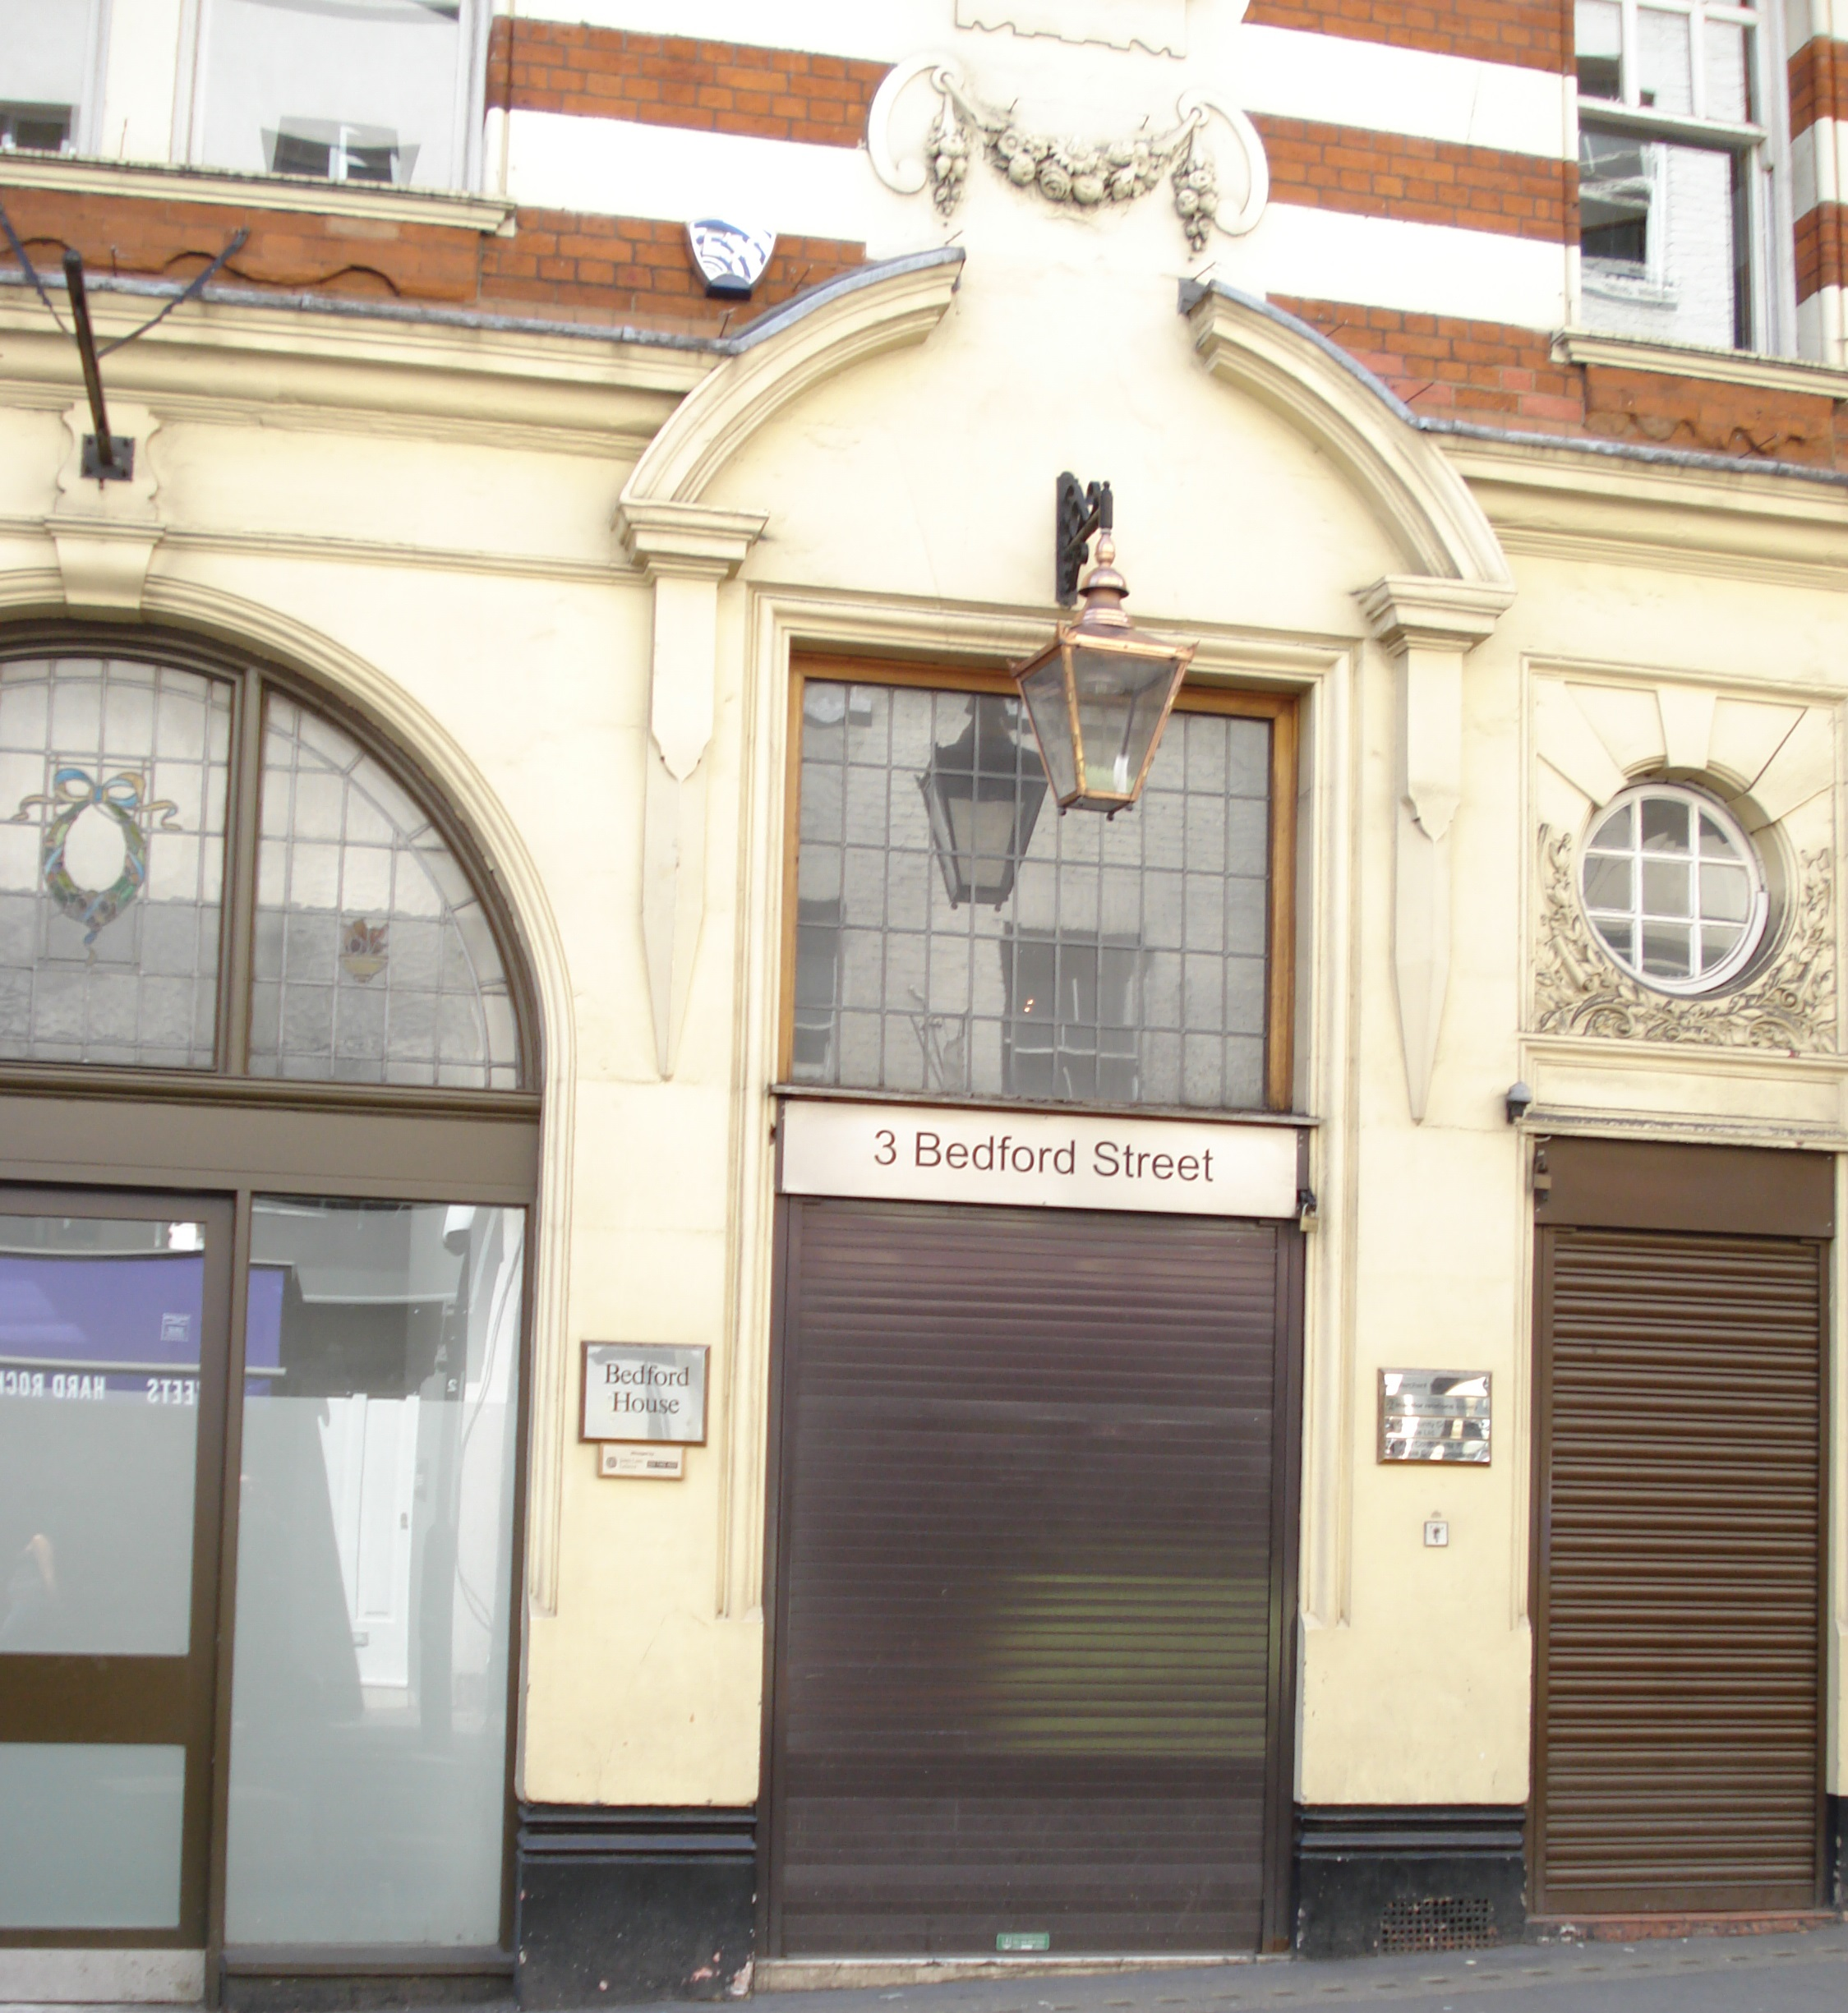 3 Bedford Street, Covent Garden